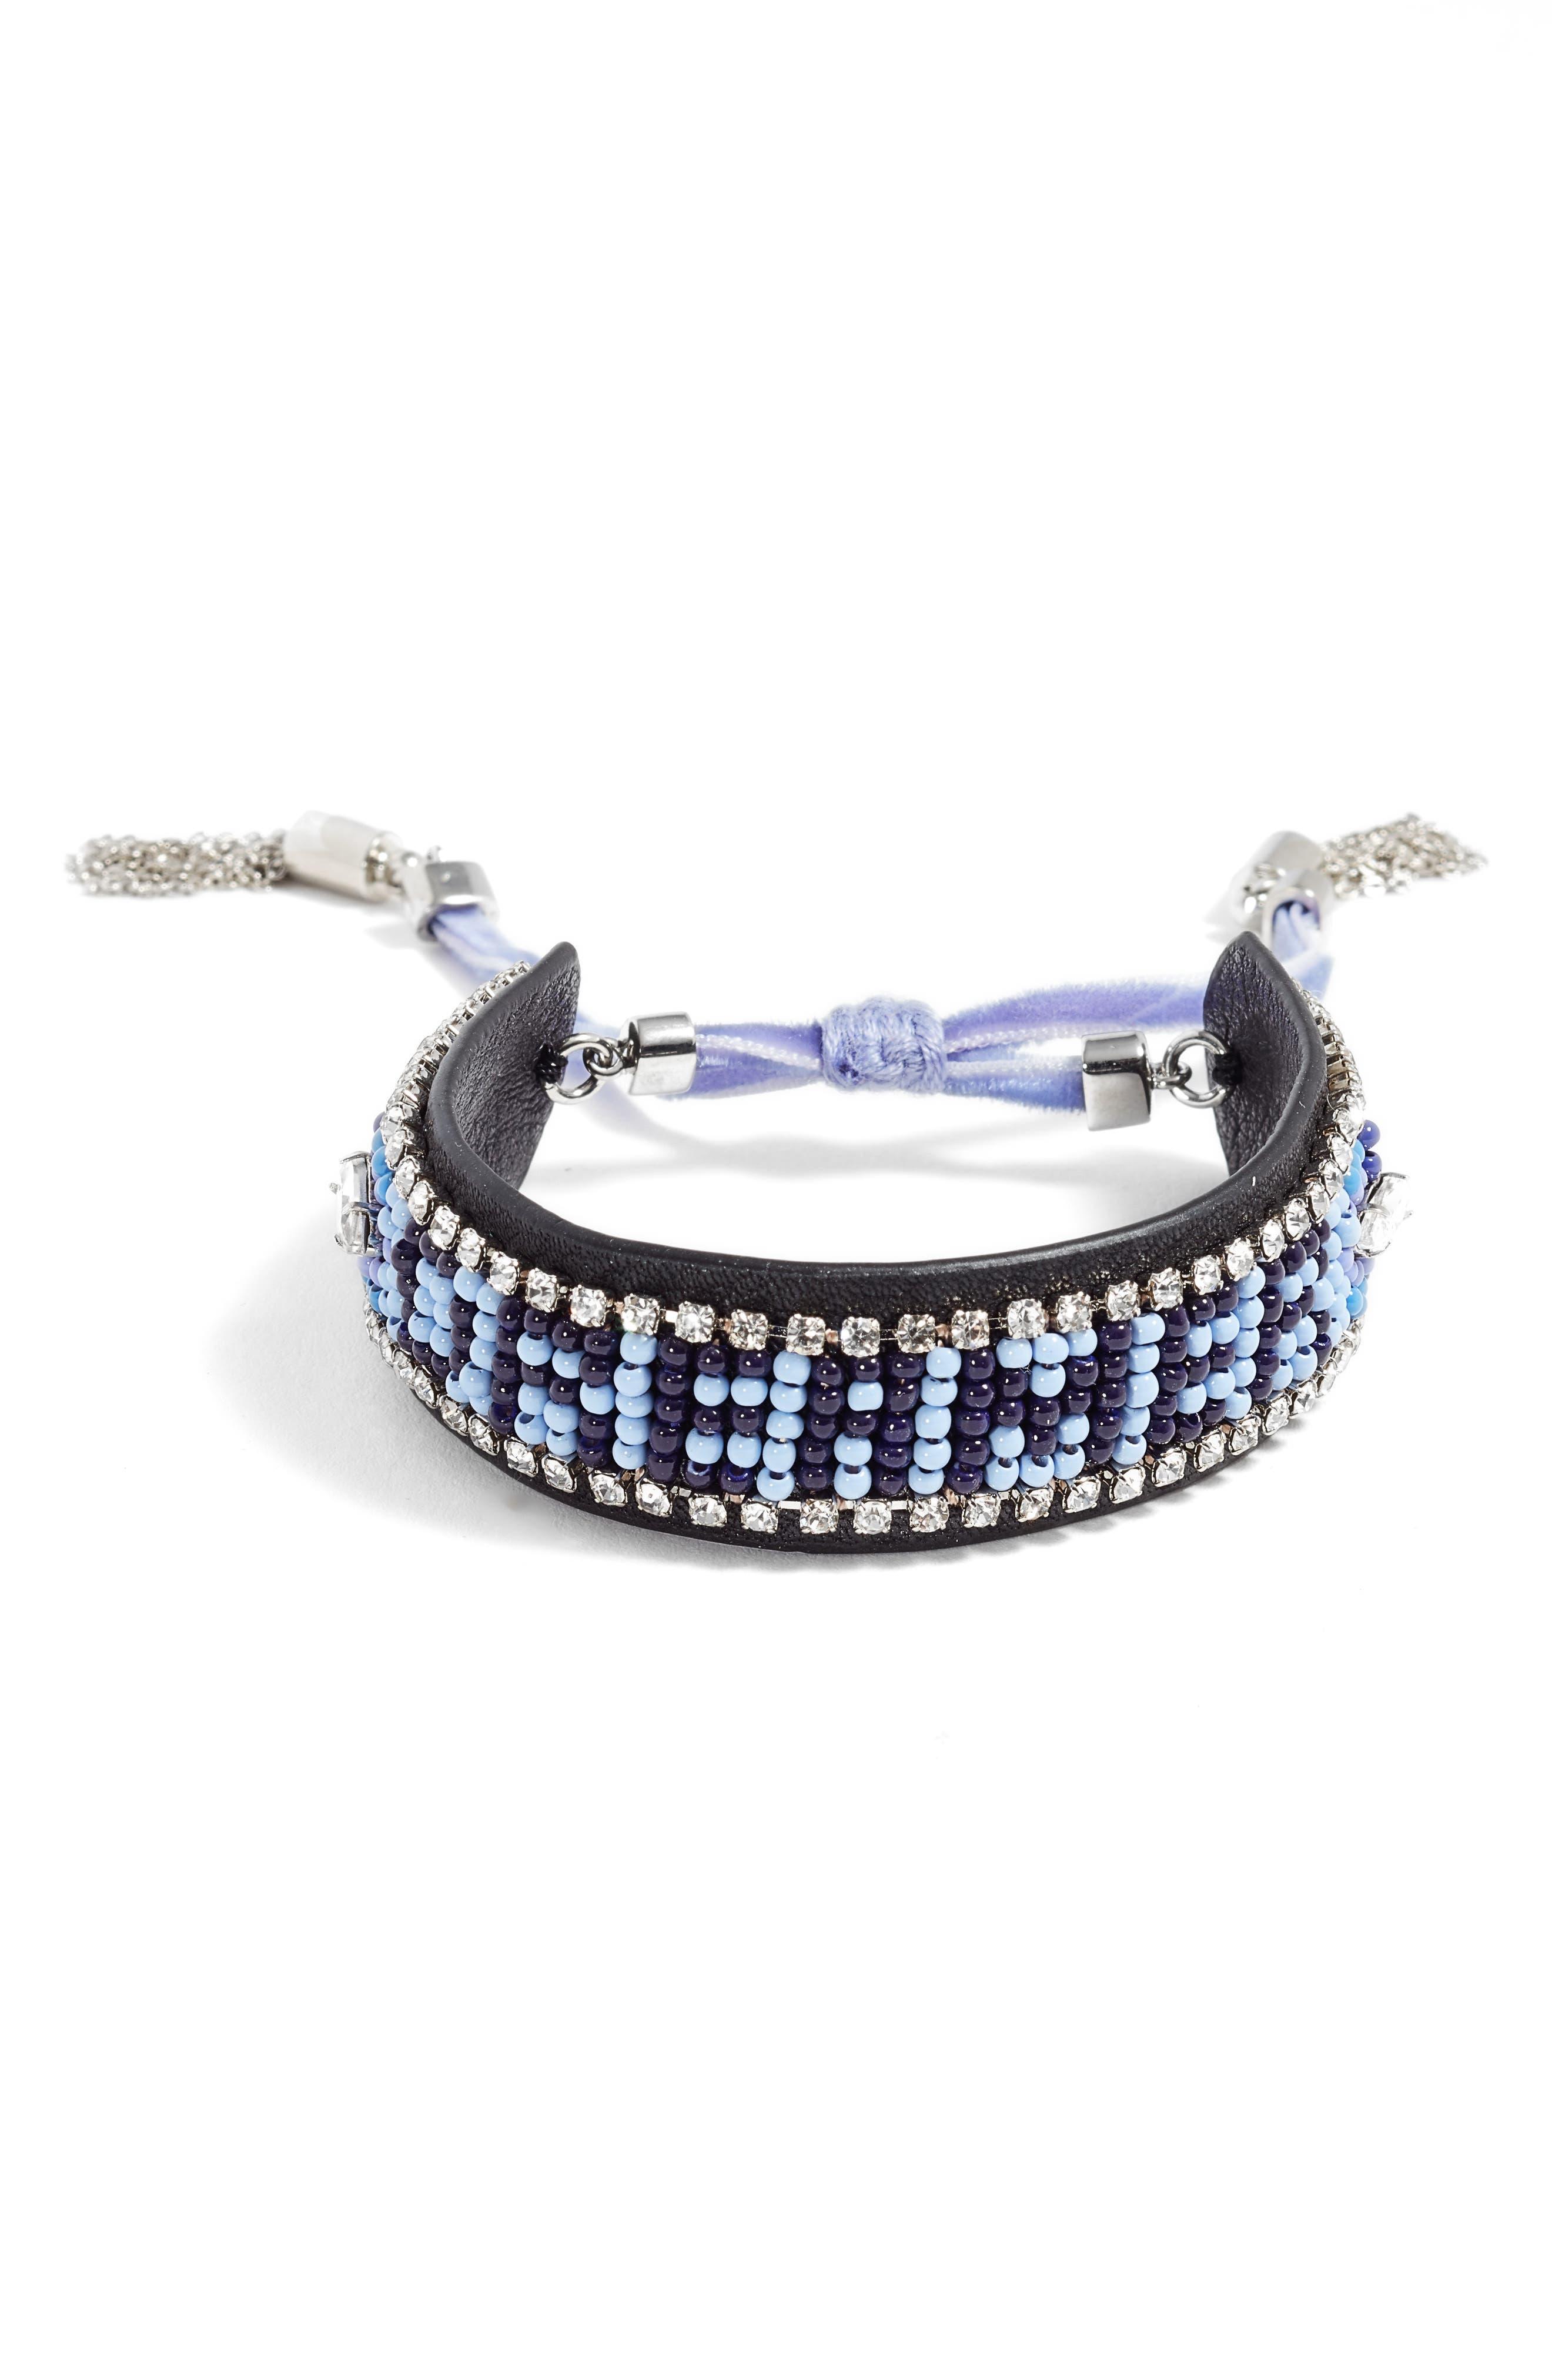 Dreamer Seed Bead Leather Bracelet,                             Main thumbnail 1, color,                             400